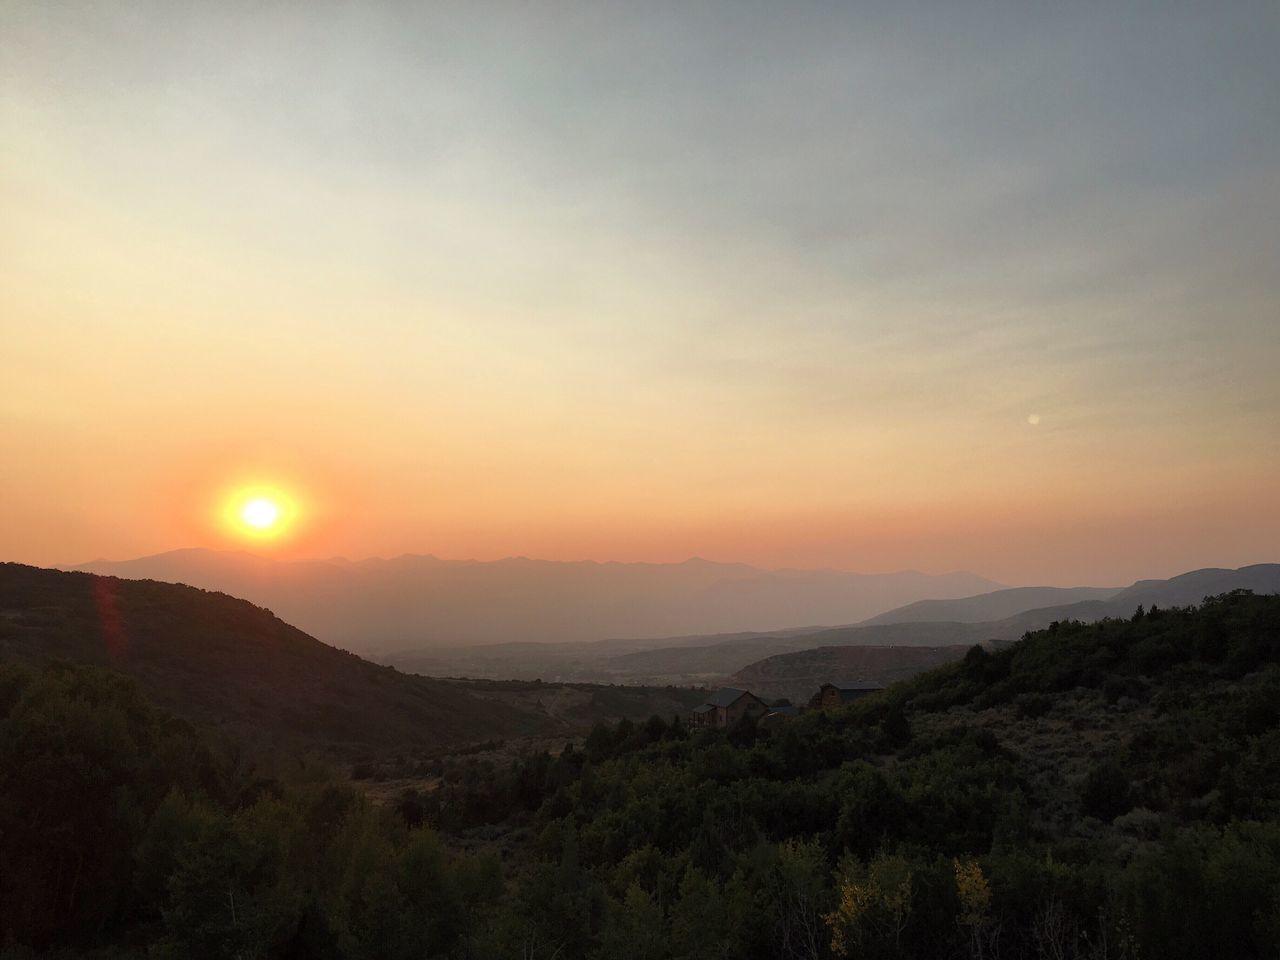 sky, sunset, scenics - nature, beauty in nature, mountain, tranquility, tranquil scene, landscape, environment, non-urban scene, sun, idyllic, nature, orange color, mountain range, no people, outdoors, land, plant, sunlight